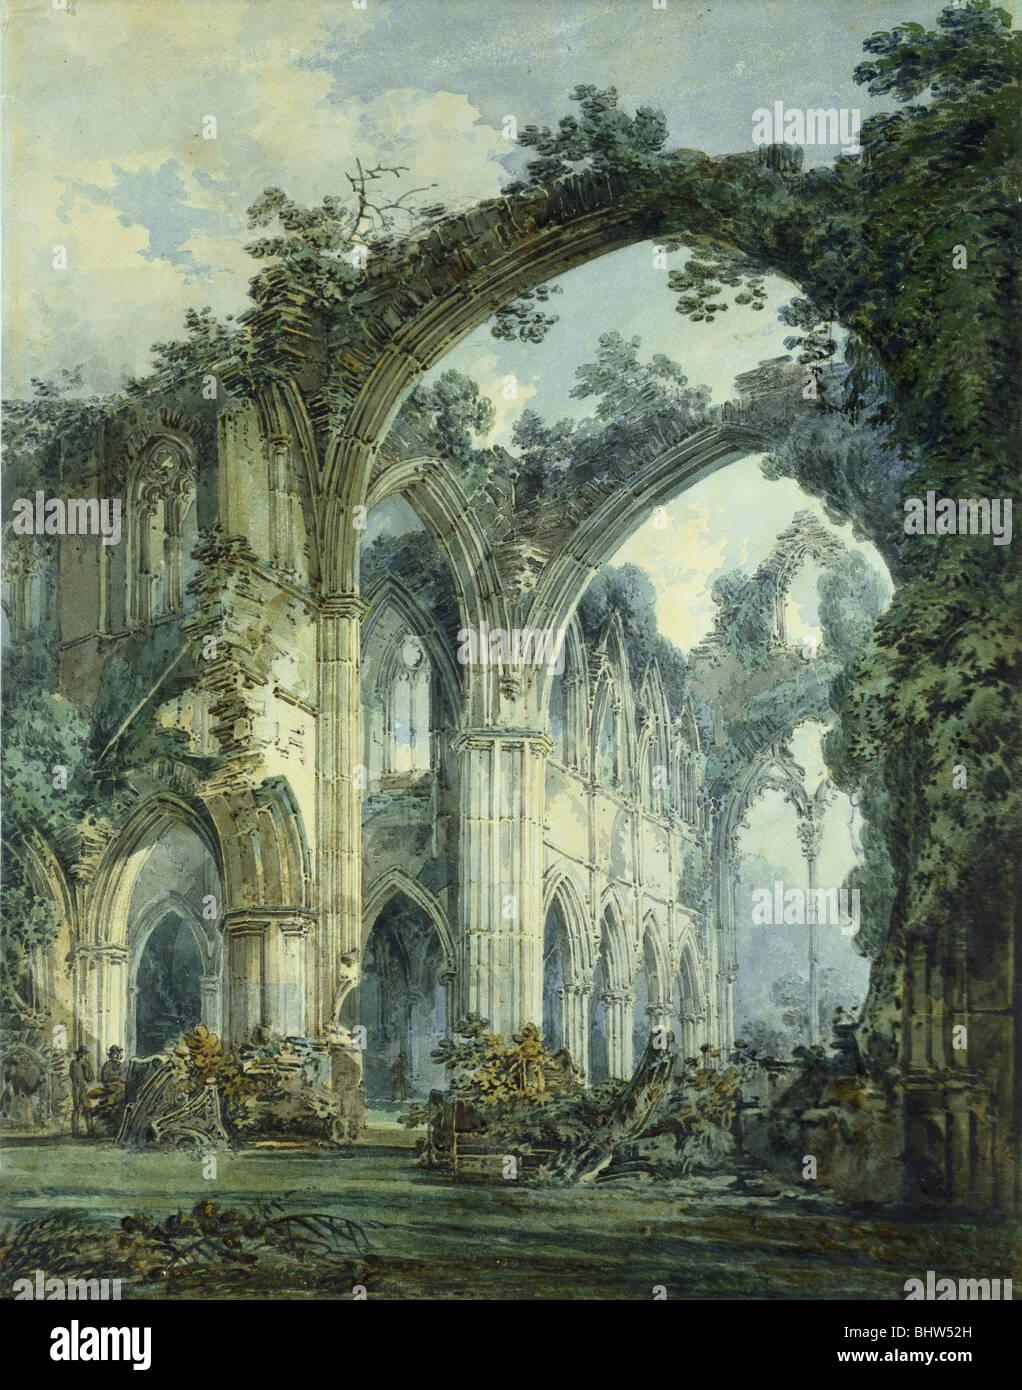 Interieur von Tintern Abbey, J.M.W Turner. England, 19. Jahrhundert Stockbild